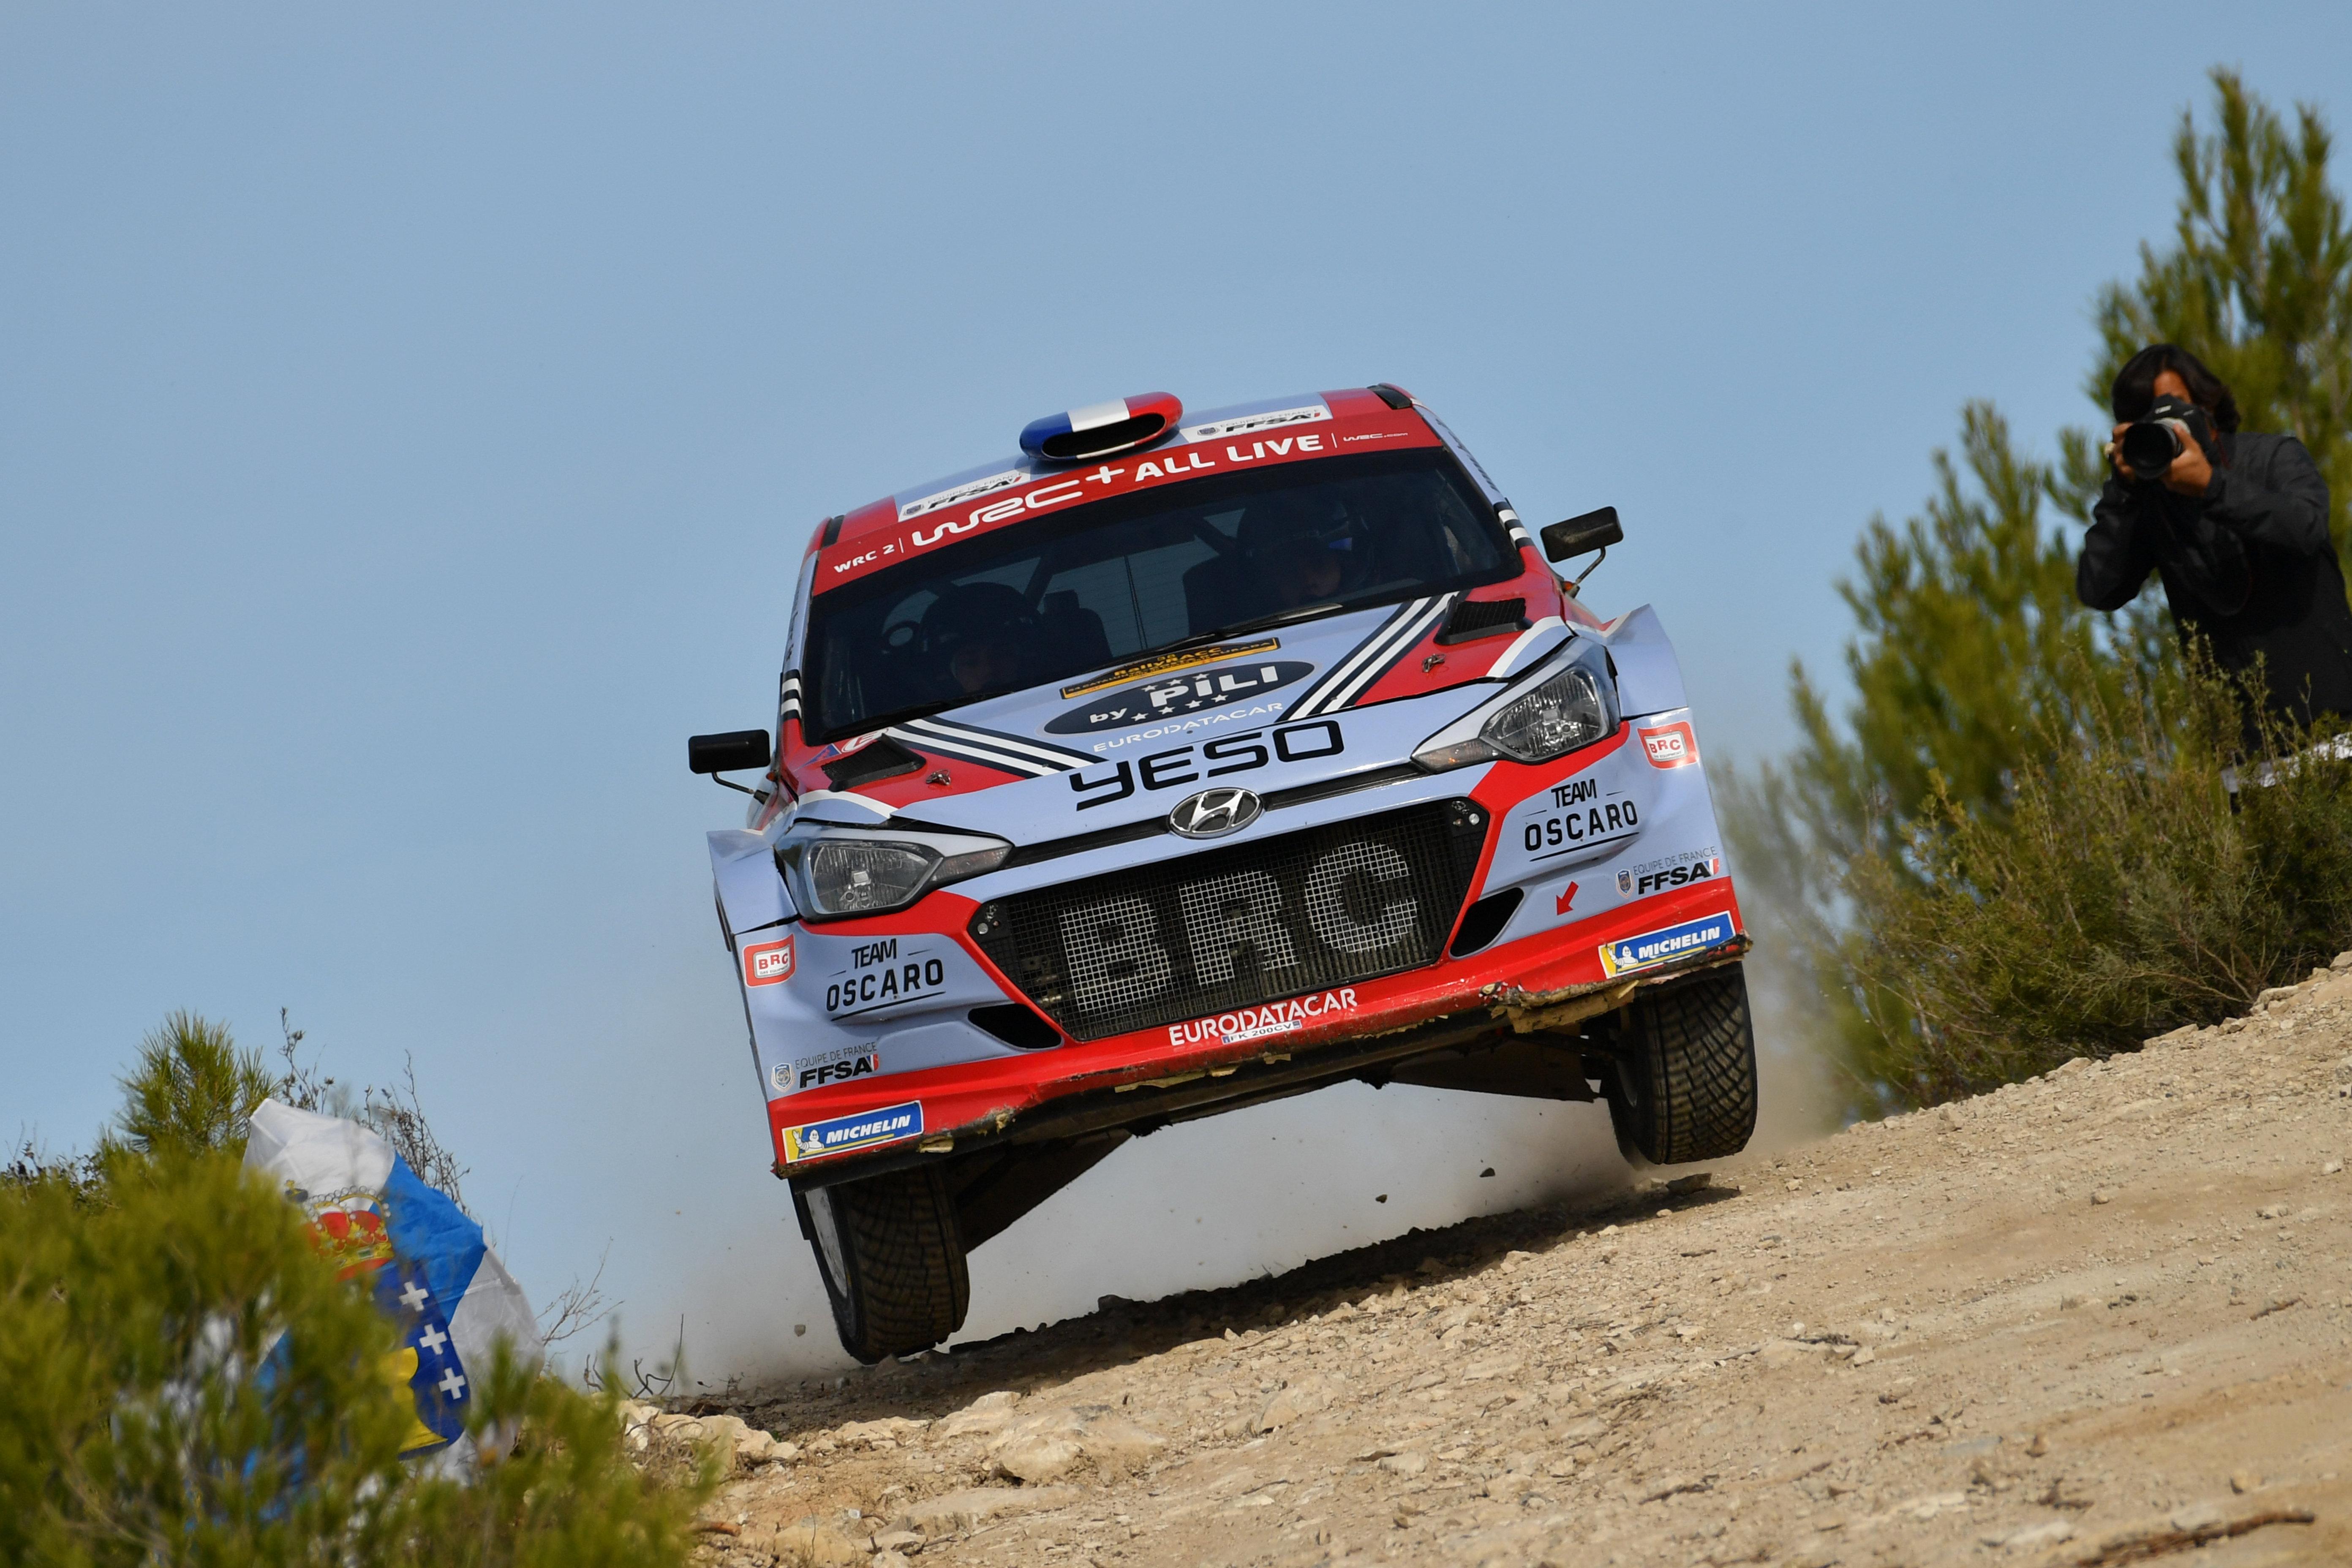 Pierre-Louis Loubet - Rally de Espana